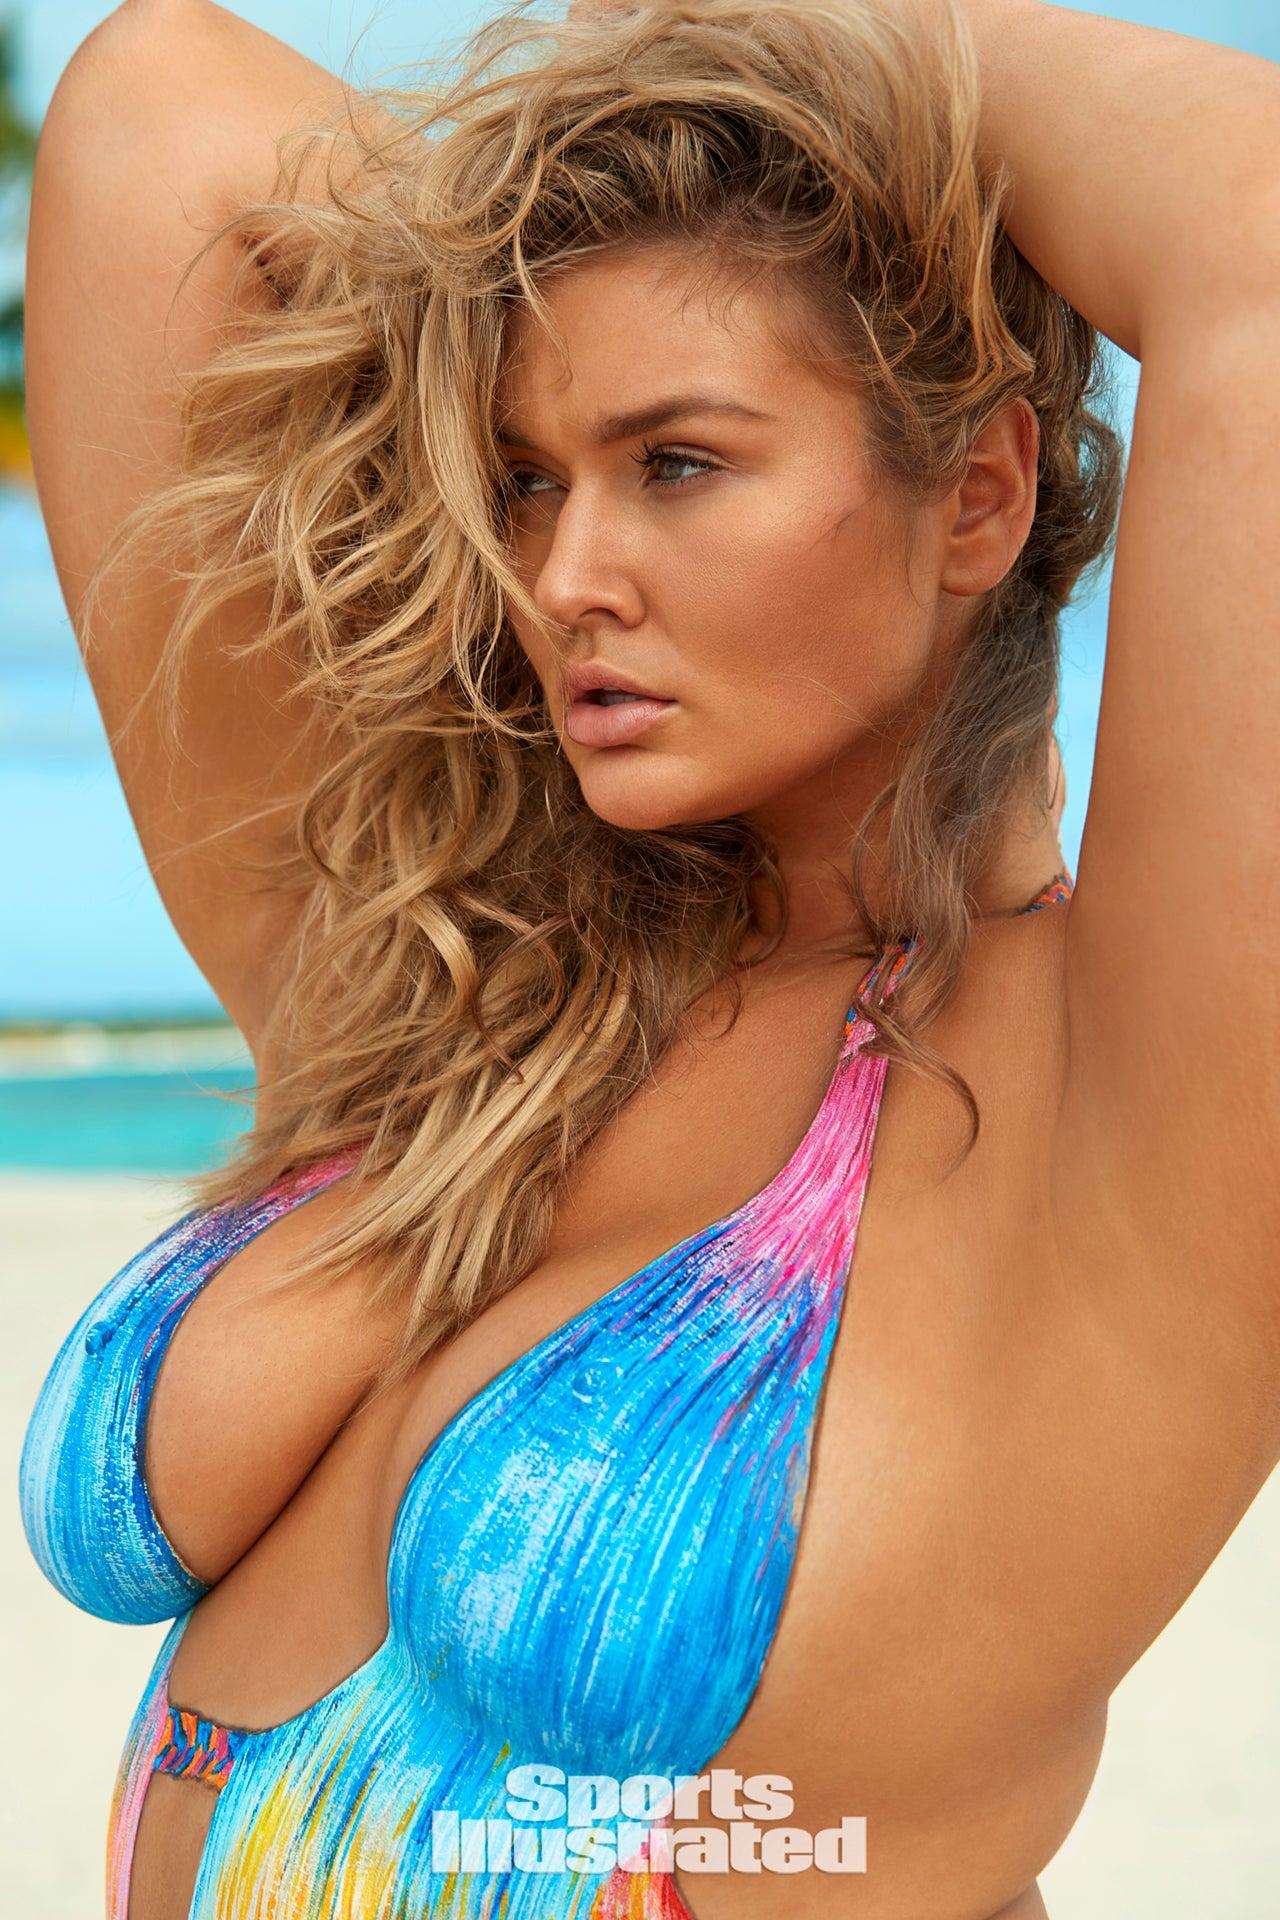 Plus-size model Hunter McGrady stars in Sports Illustrated's